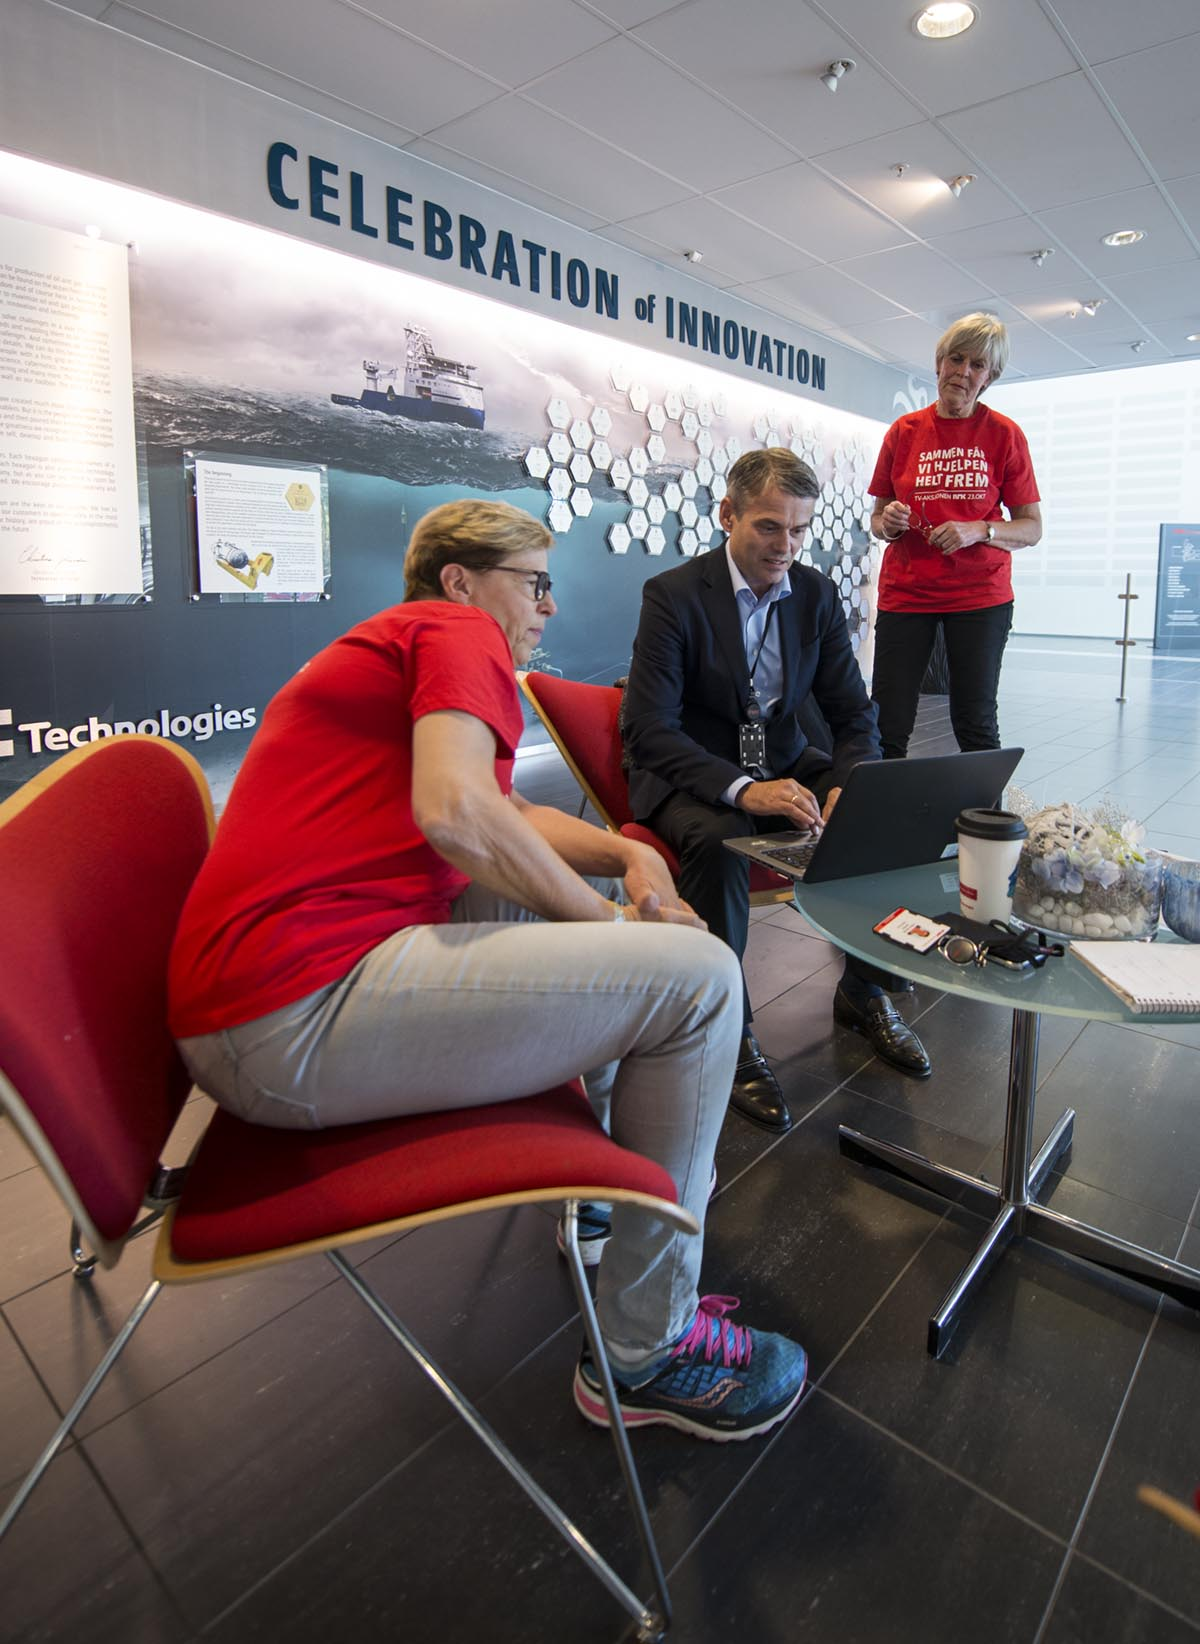 Administrerende direktør Rune Thoresen i FMC Kongsberg Subsea utfordrer nye givere sammen med Anne-Jenny Archer og Berit Kleven. Foto: Bjørn Isaksen